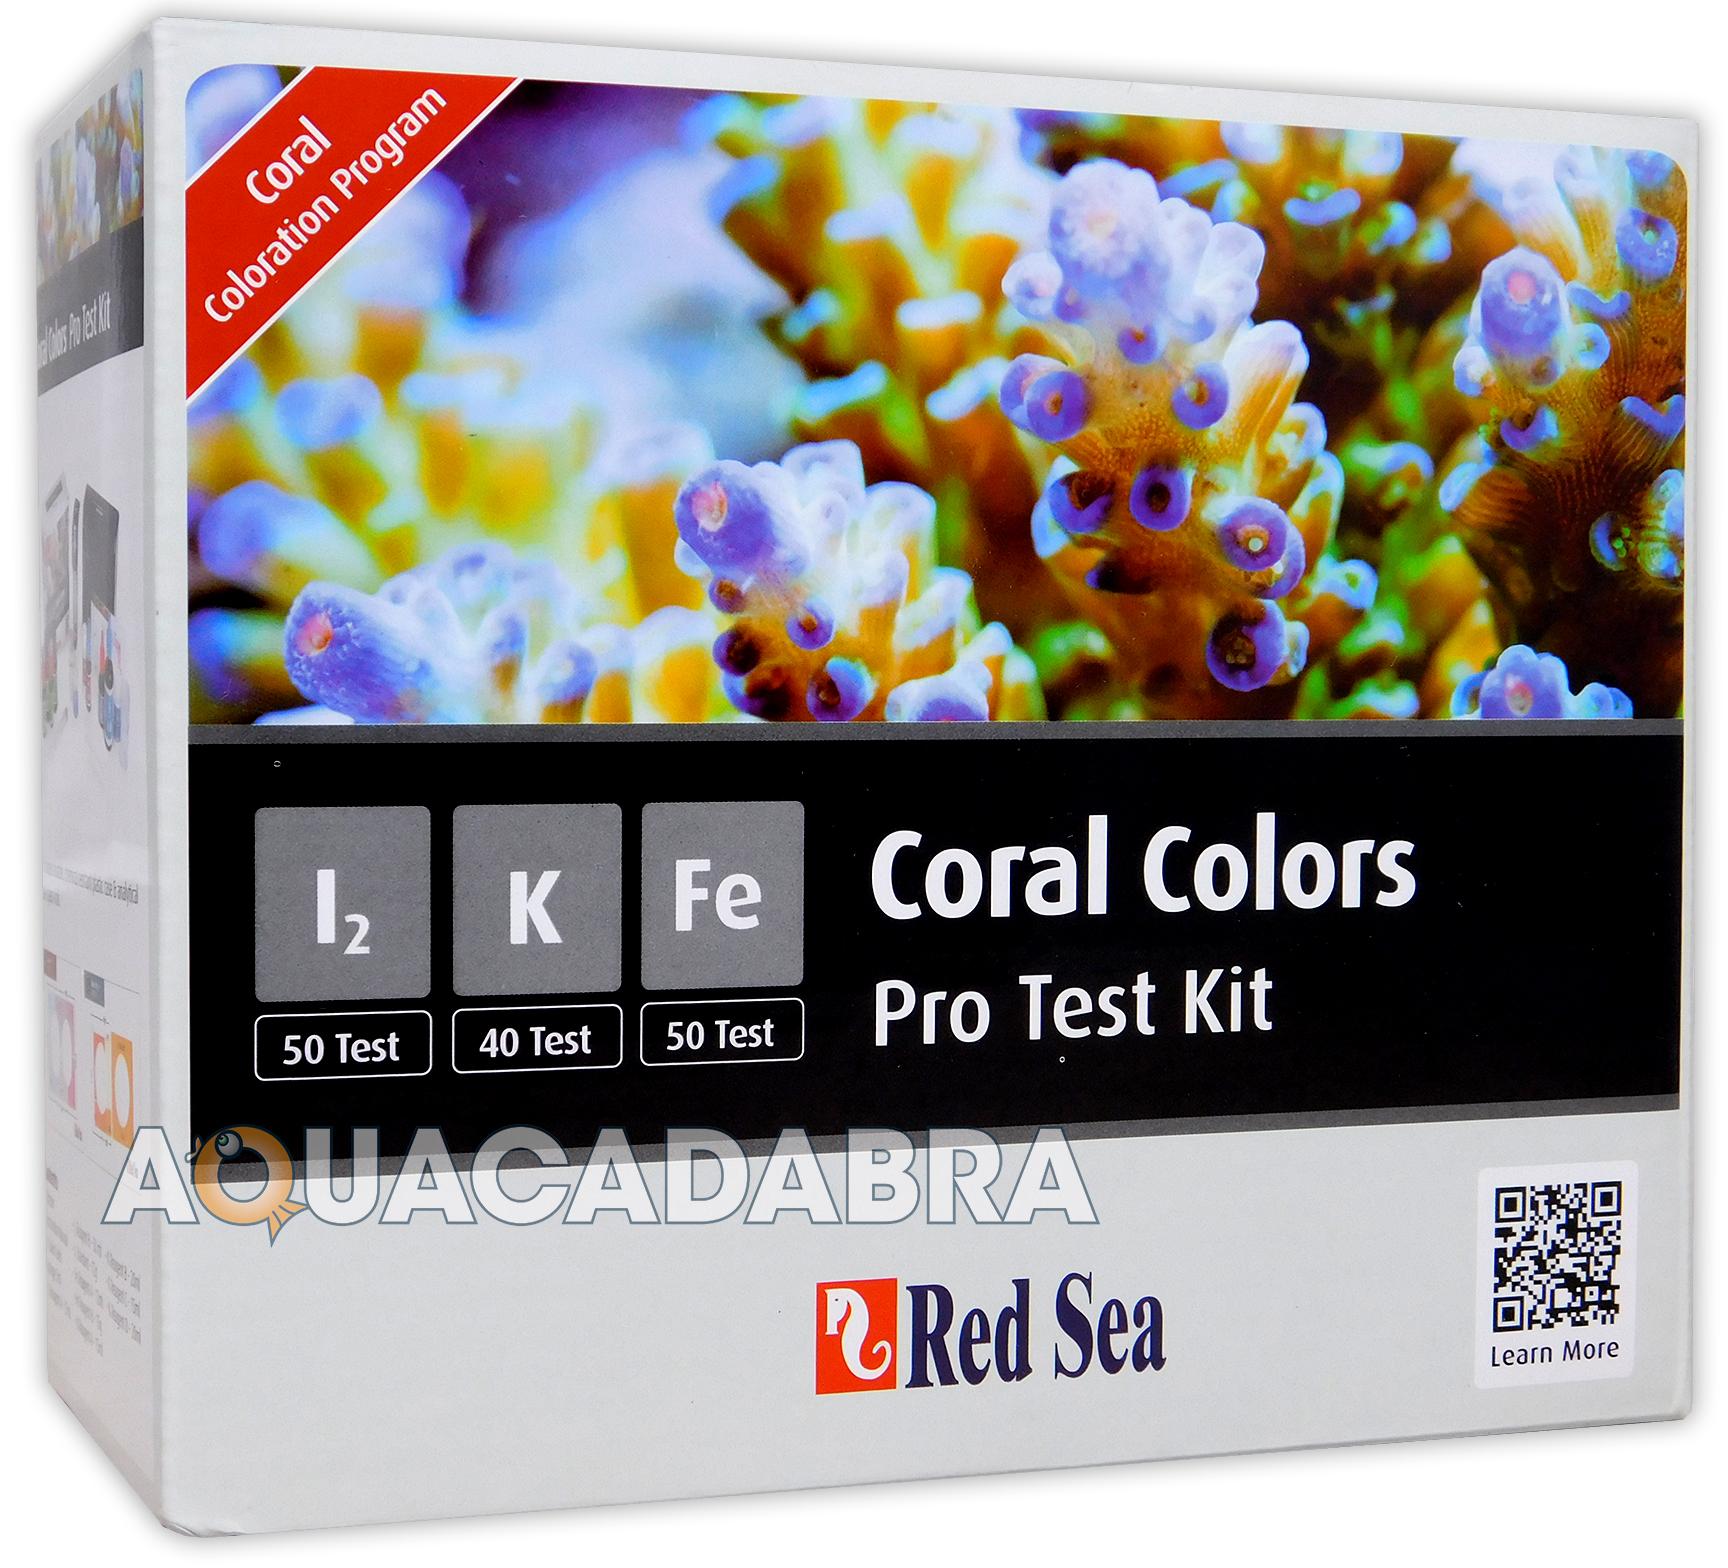 Fish tank test kit - Red Sea Coral Colours A B C D Marine Reef Treatments